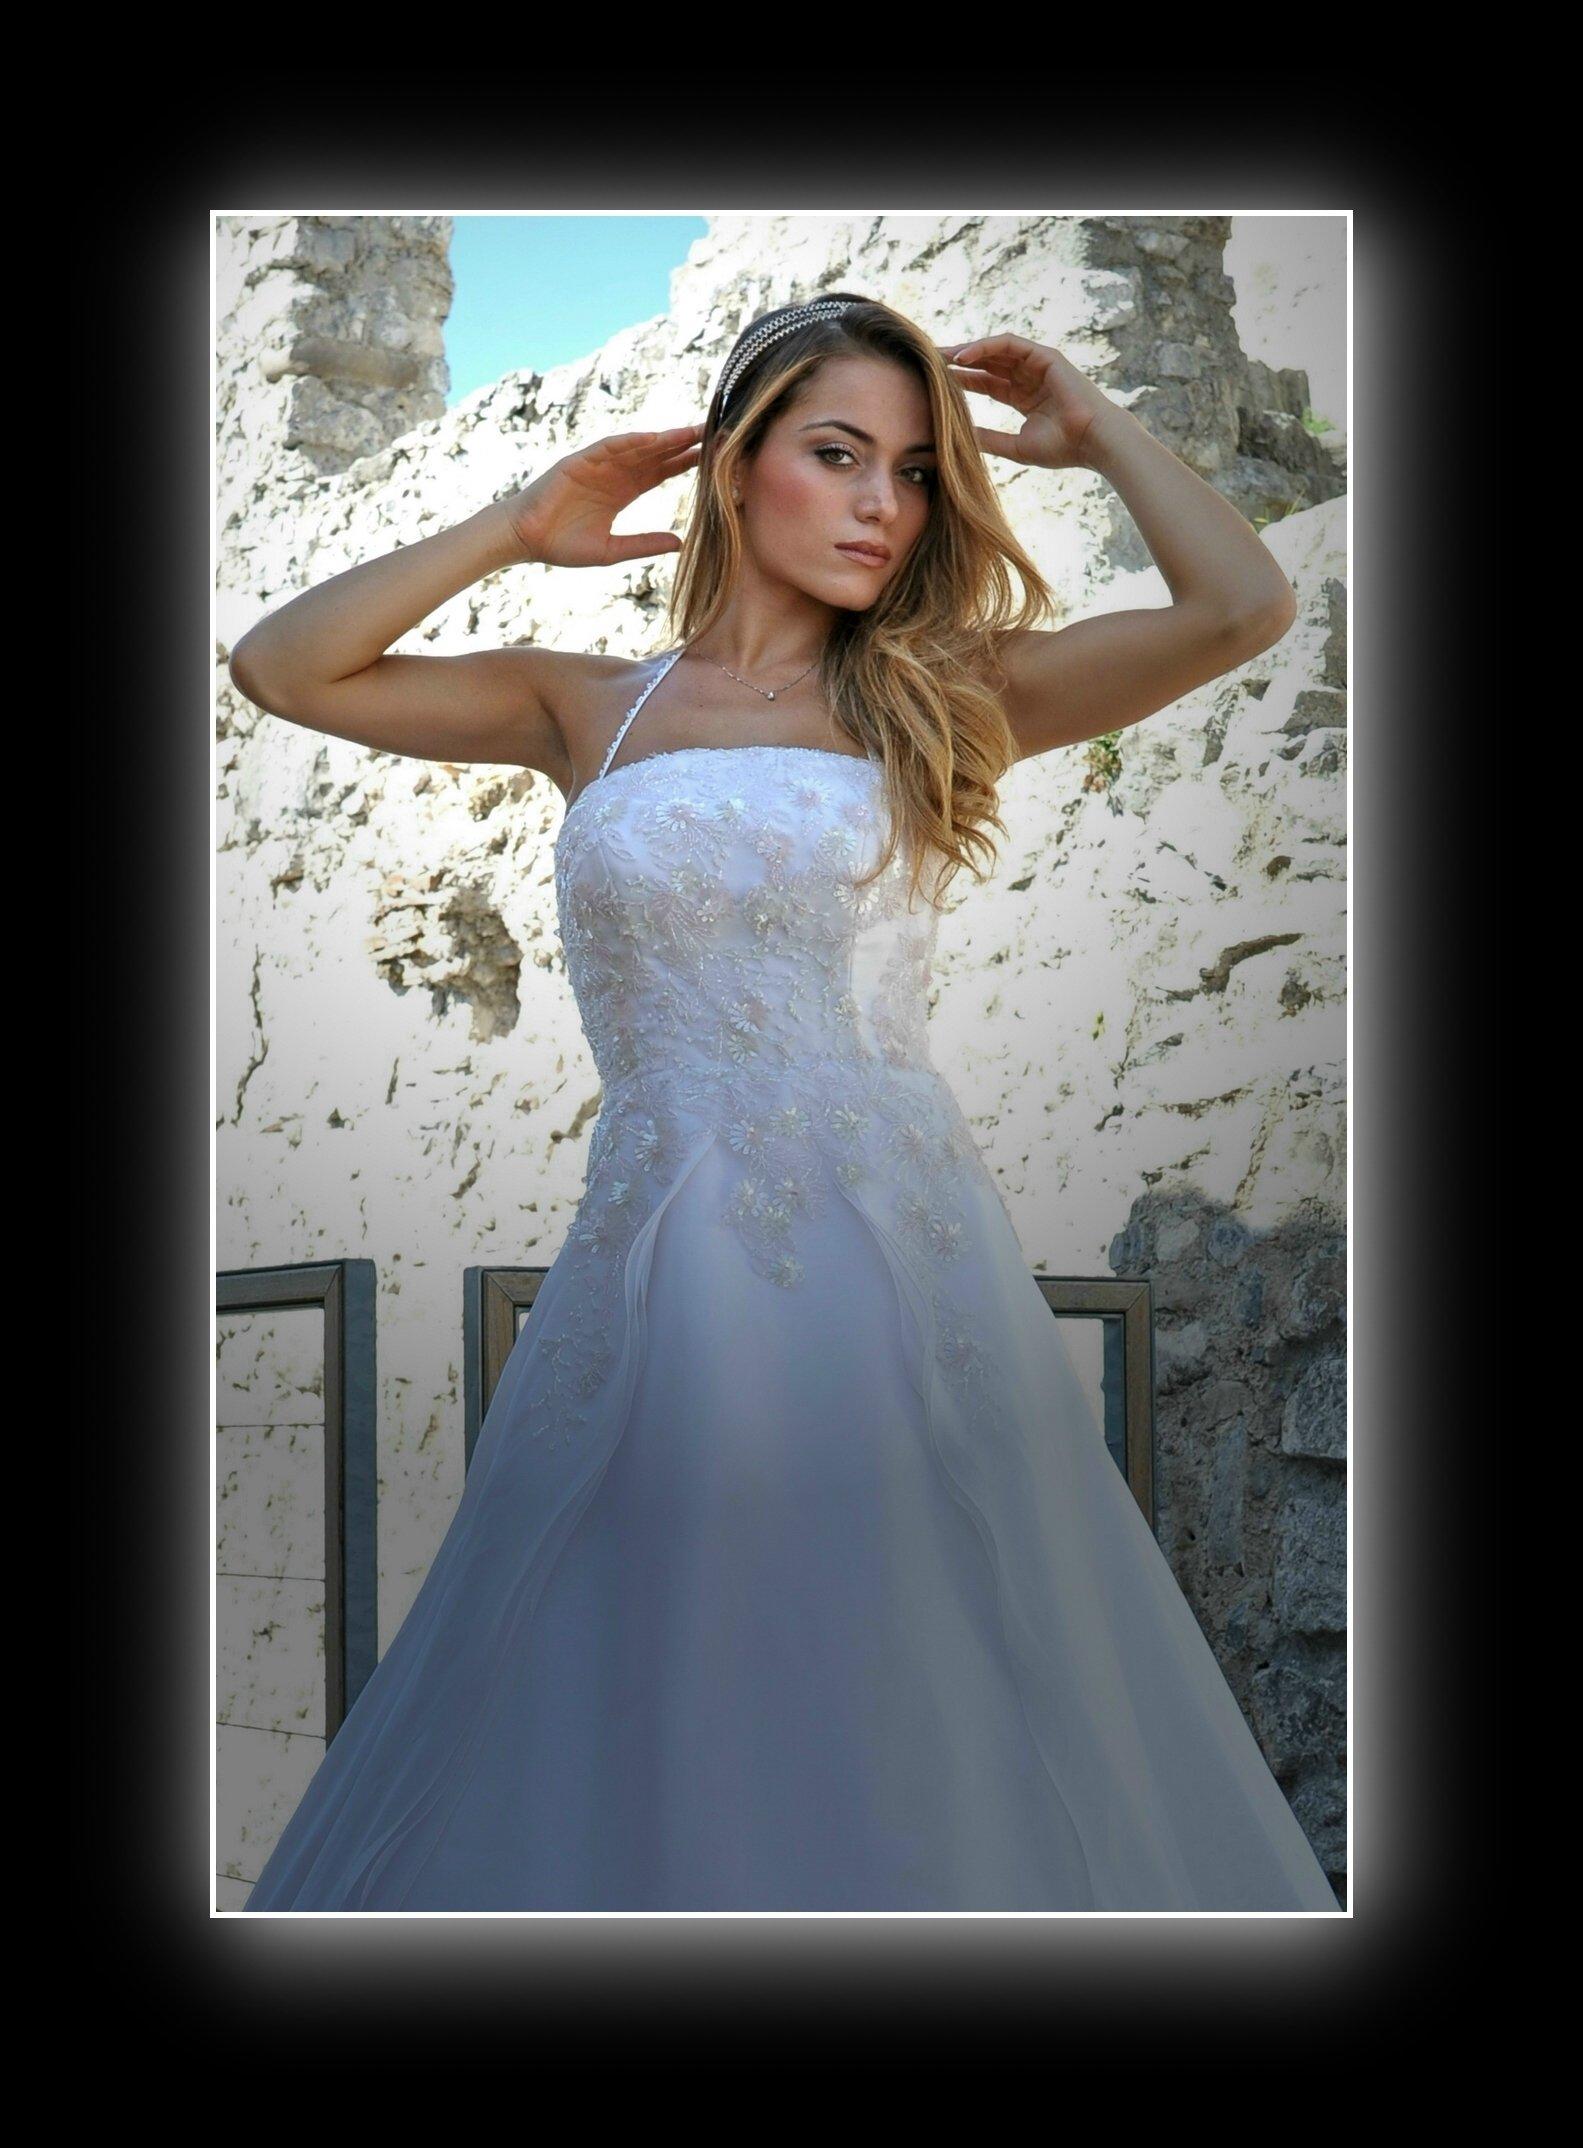 modella bionda vestita da sposa